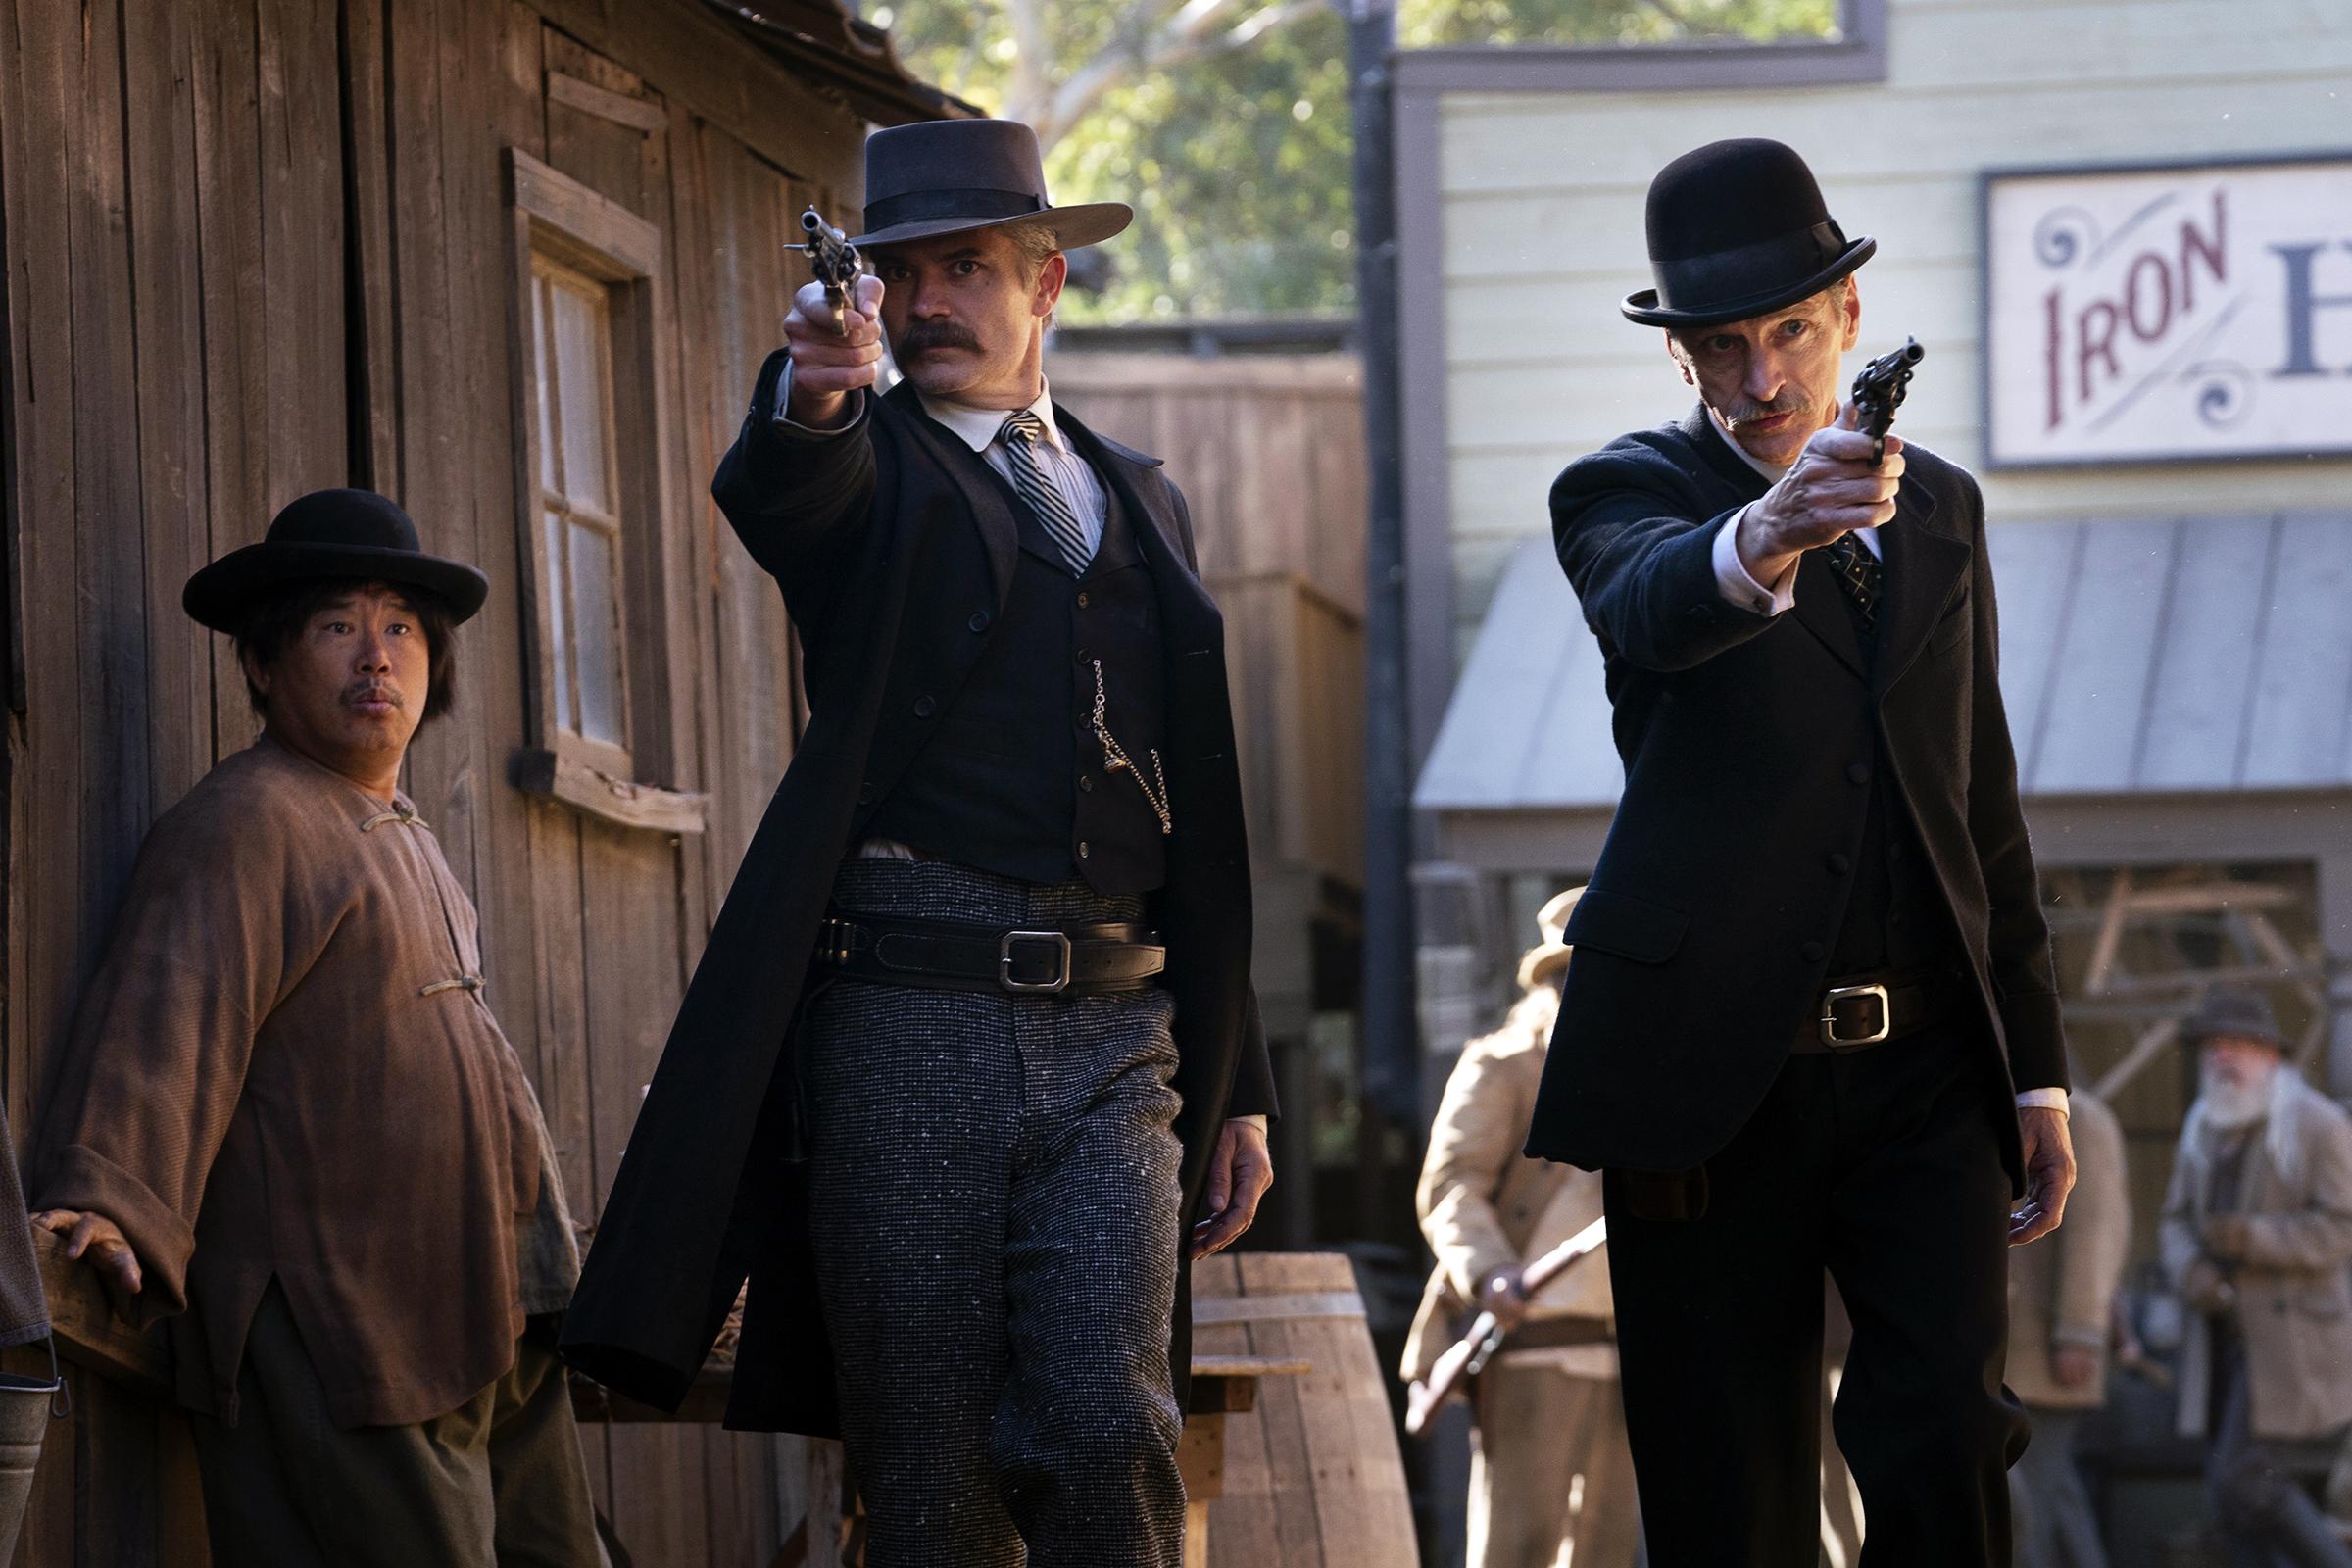 'Deadwood' Rides Again